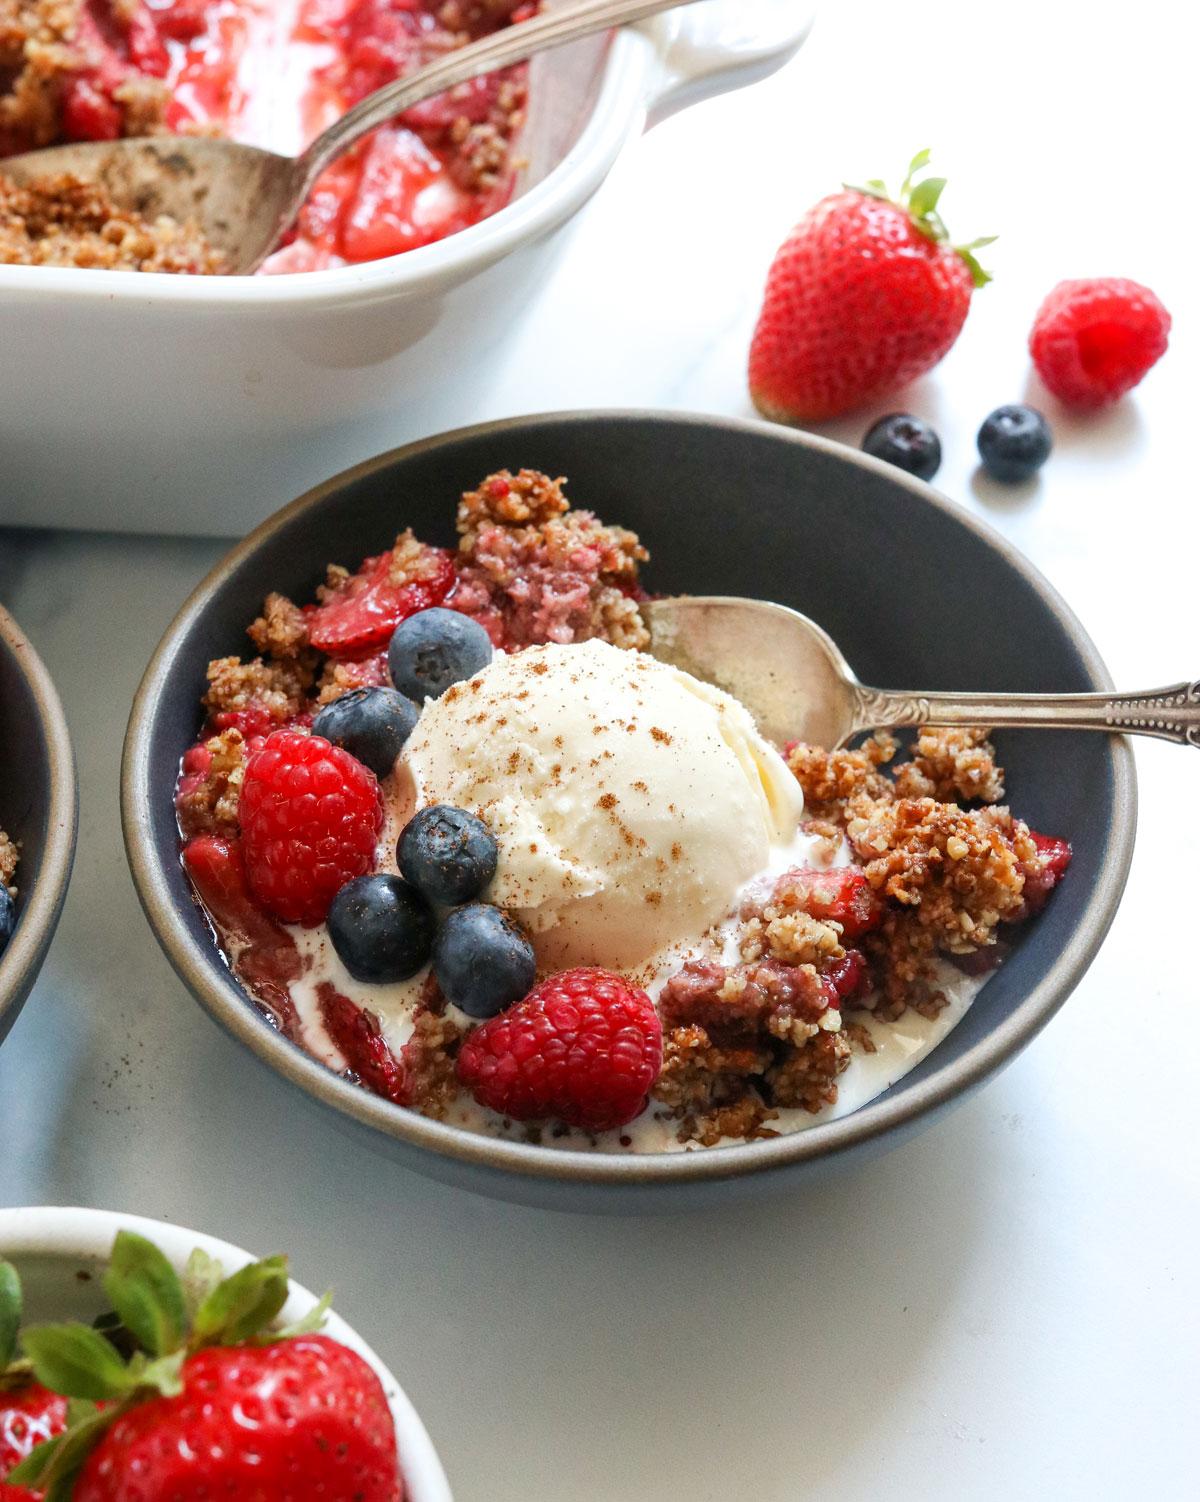 paleo berry crisp in dark bowl with ice cream